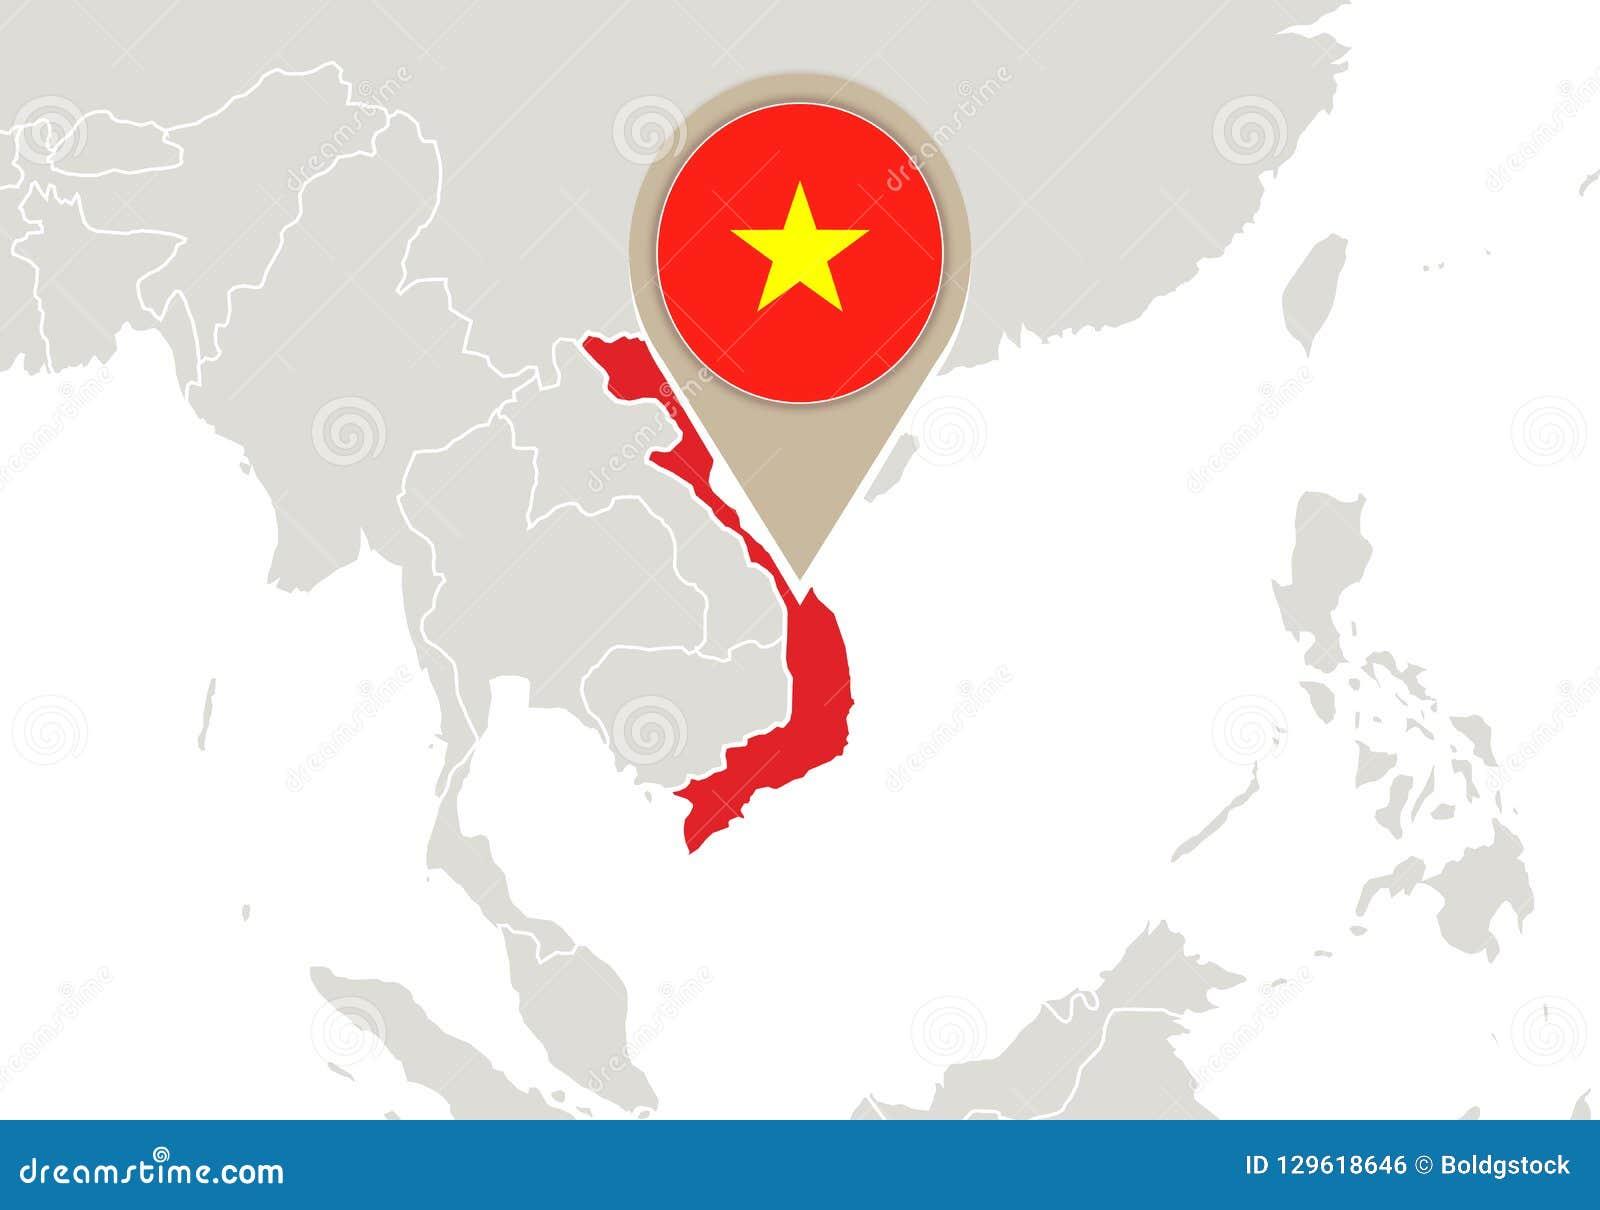 Vietnam on World map stock vector. Illustration of national ...